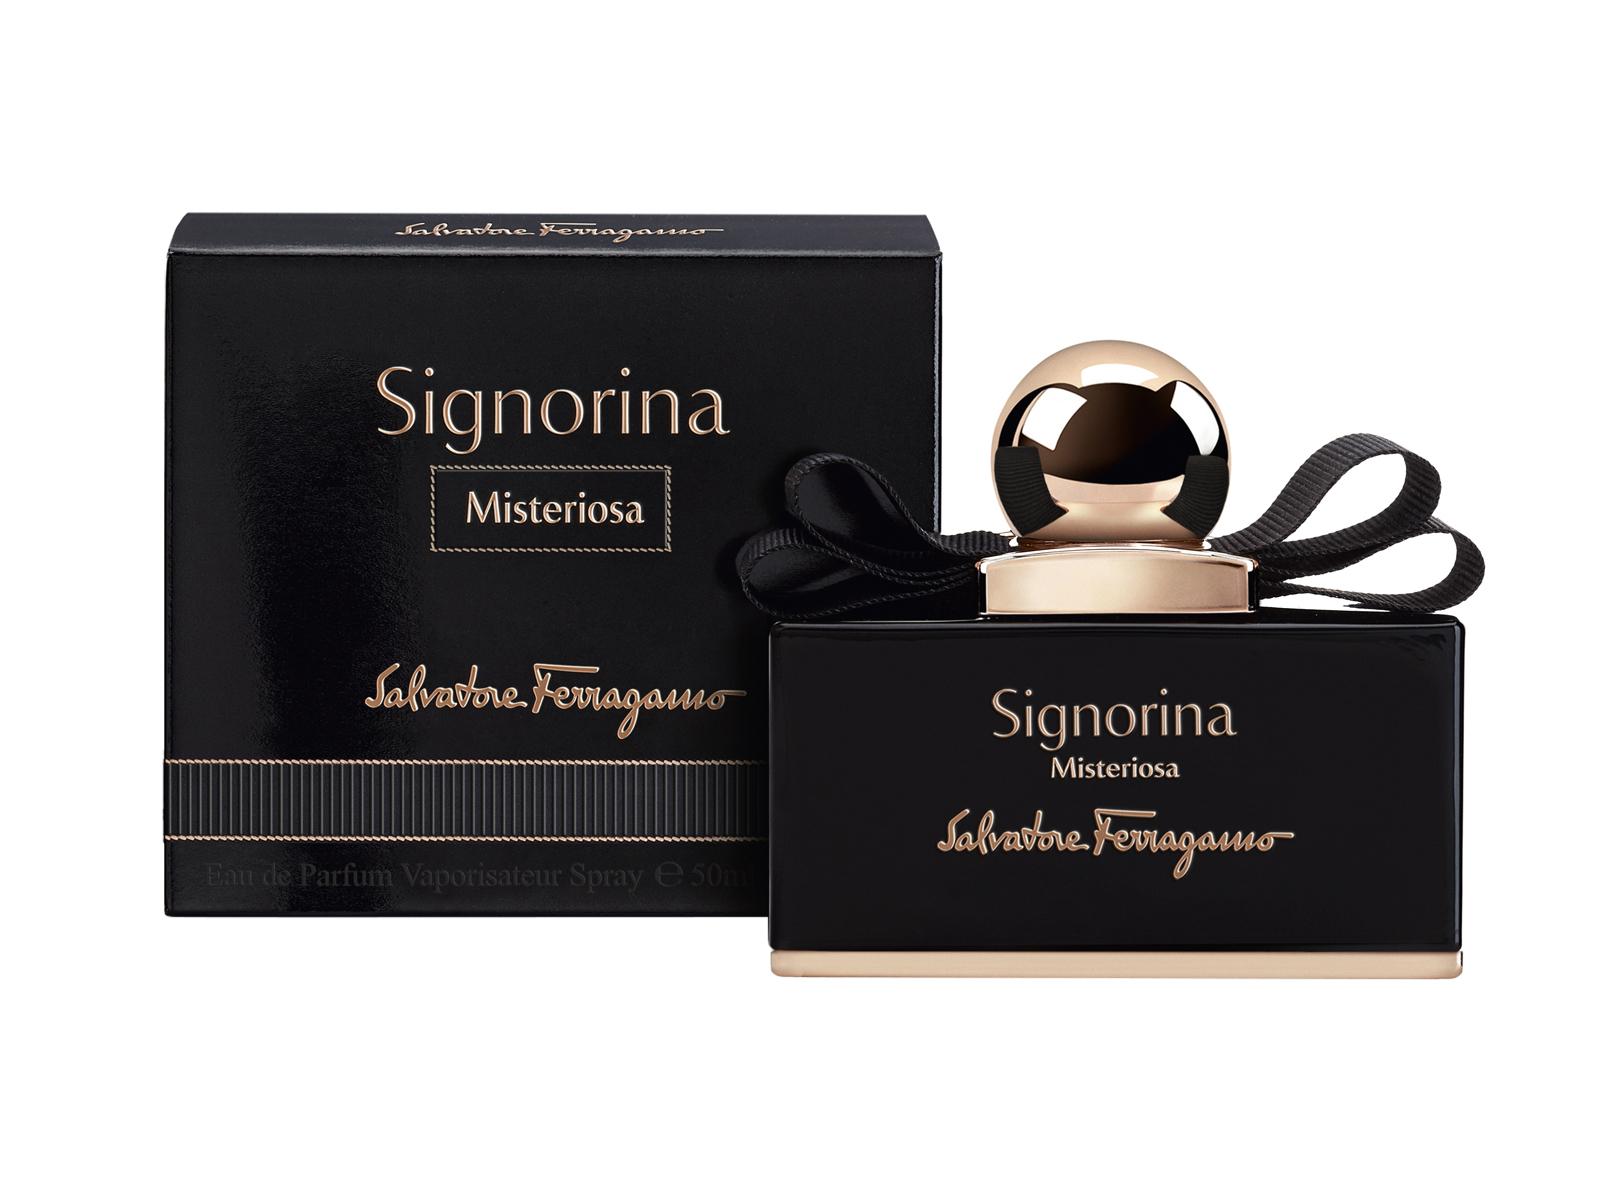 Date-Night Essential: Signorina Misteriosa by Salvatore Ferragamo